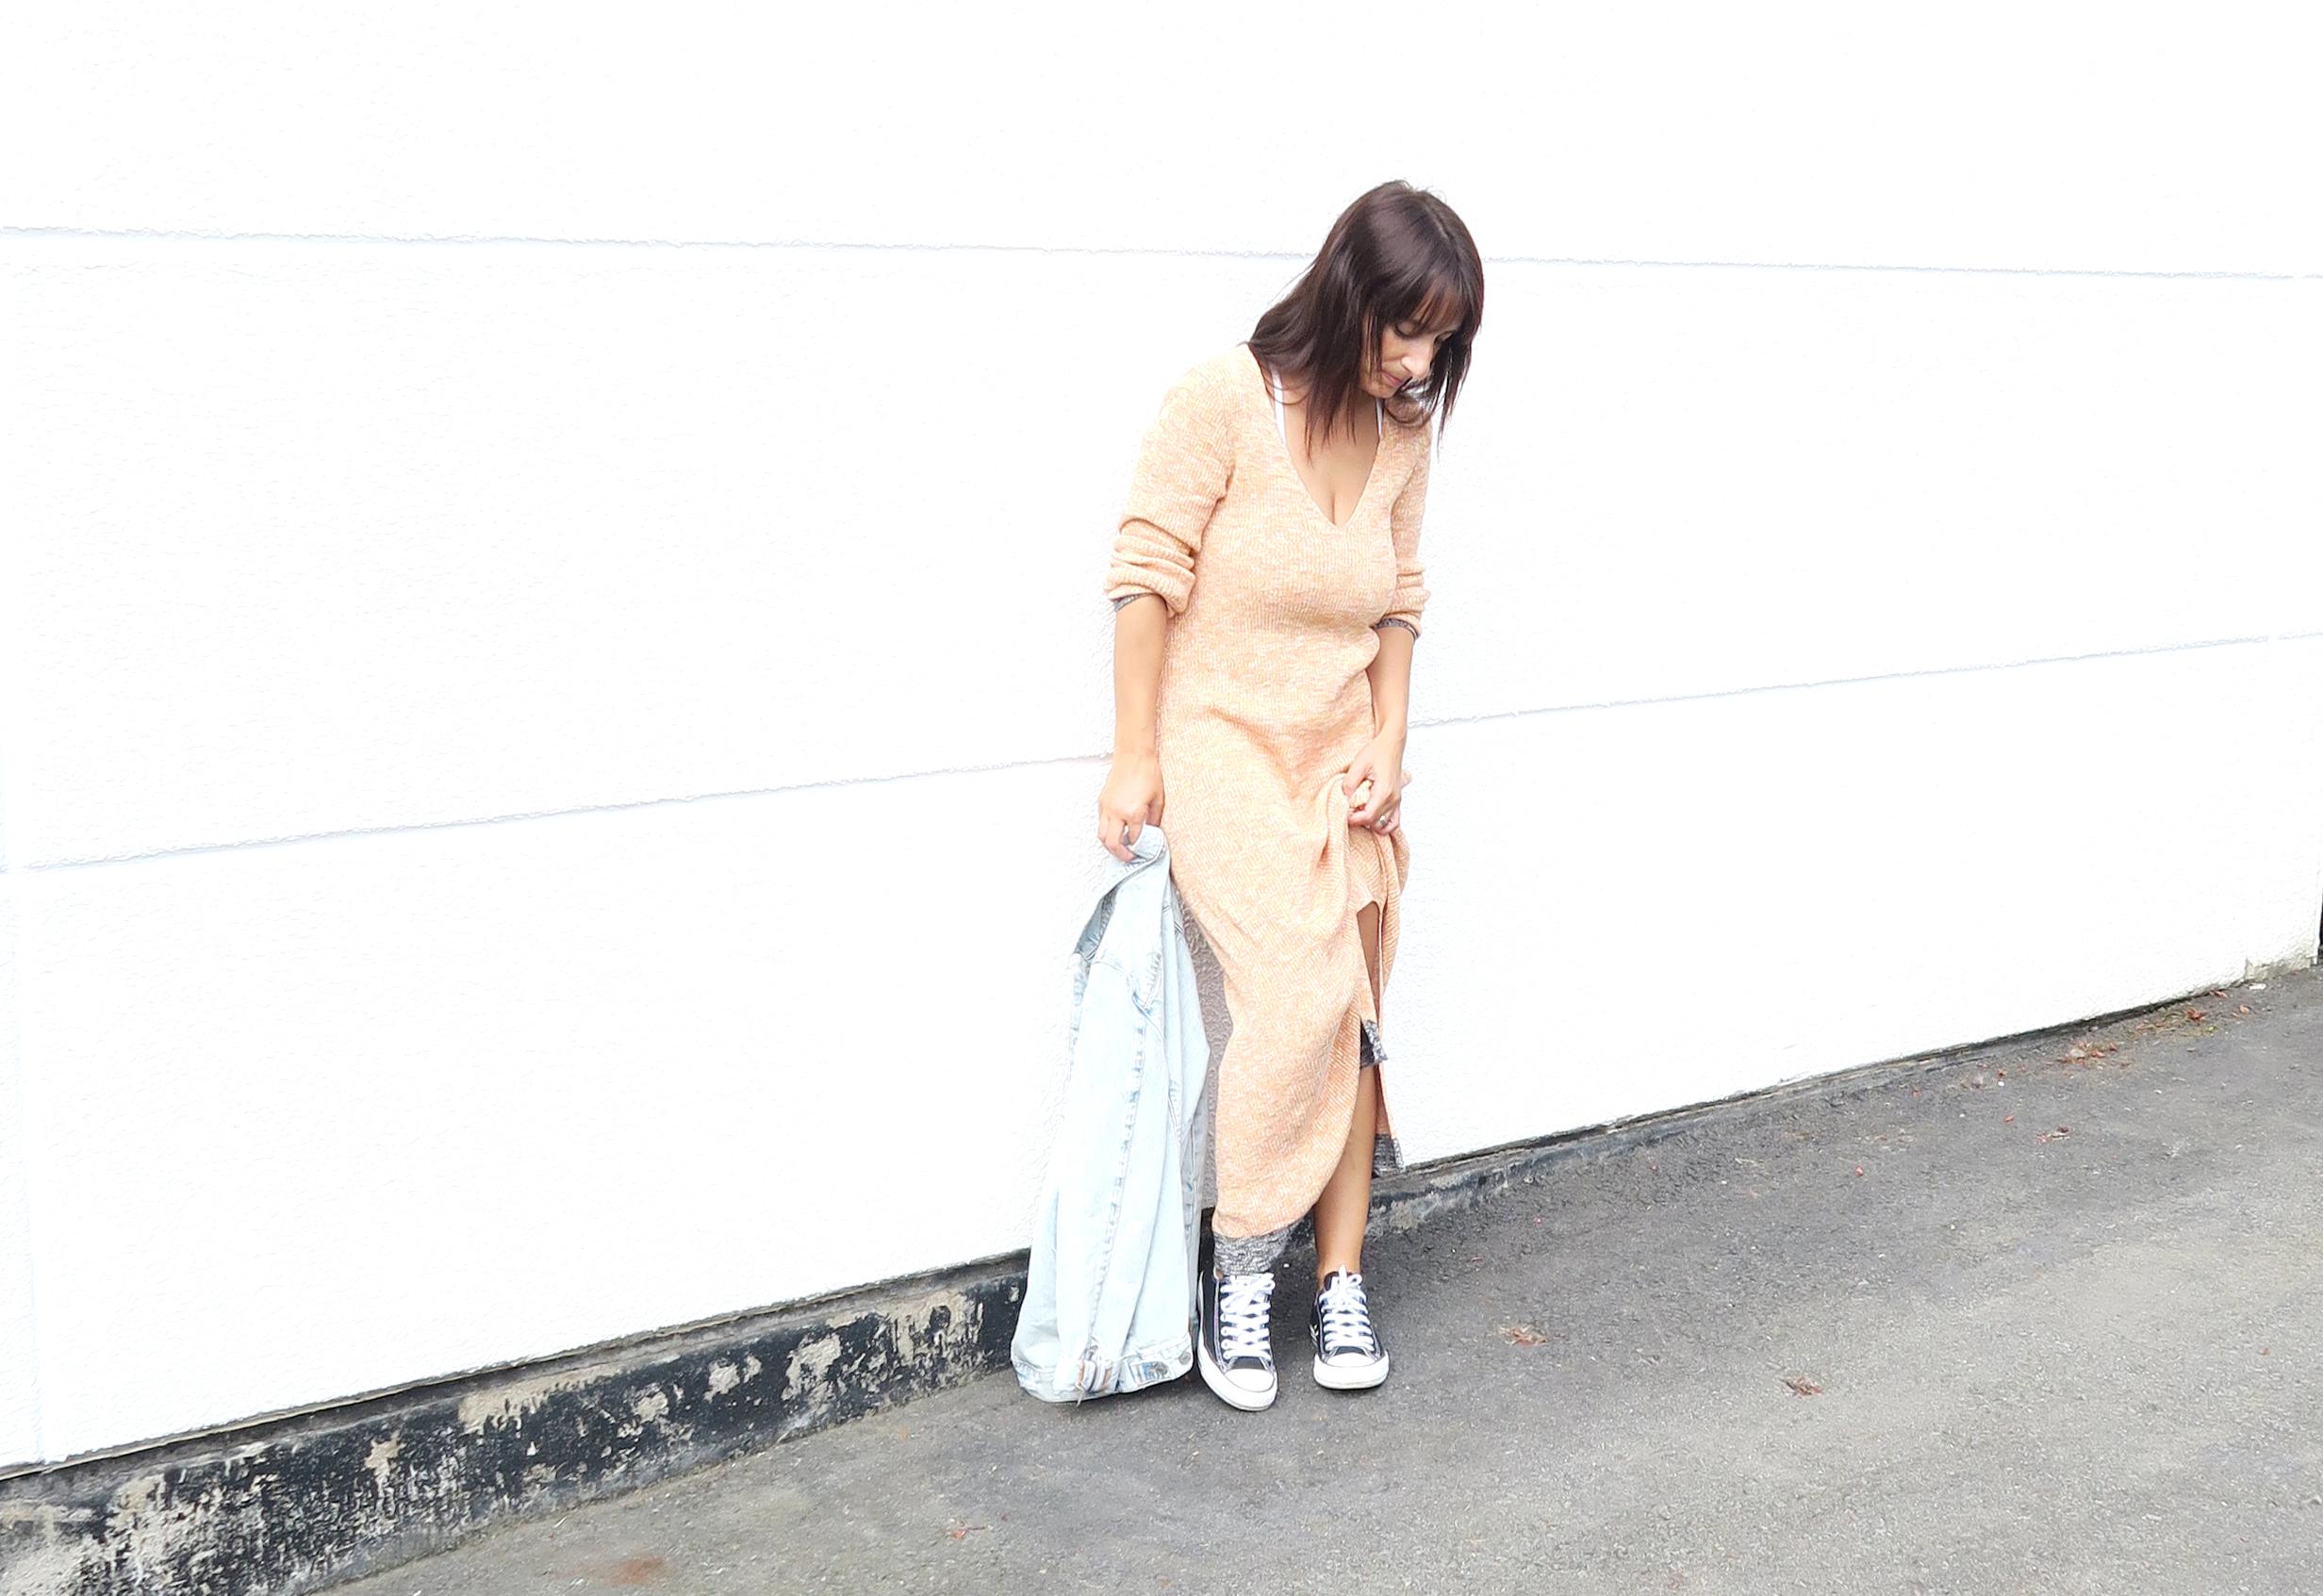 Modesalat-Blogger-Fashionblogger-Modeblogger-Streetstyle-Dress-Converse-4